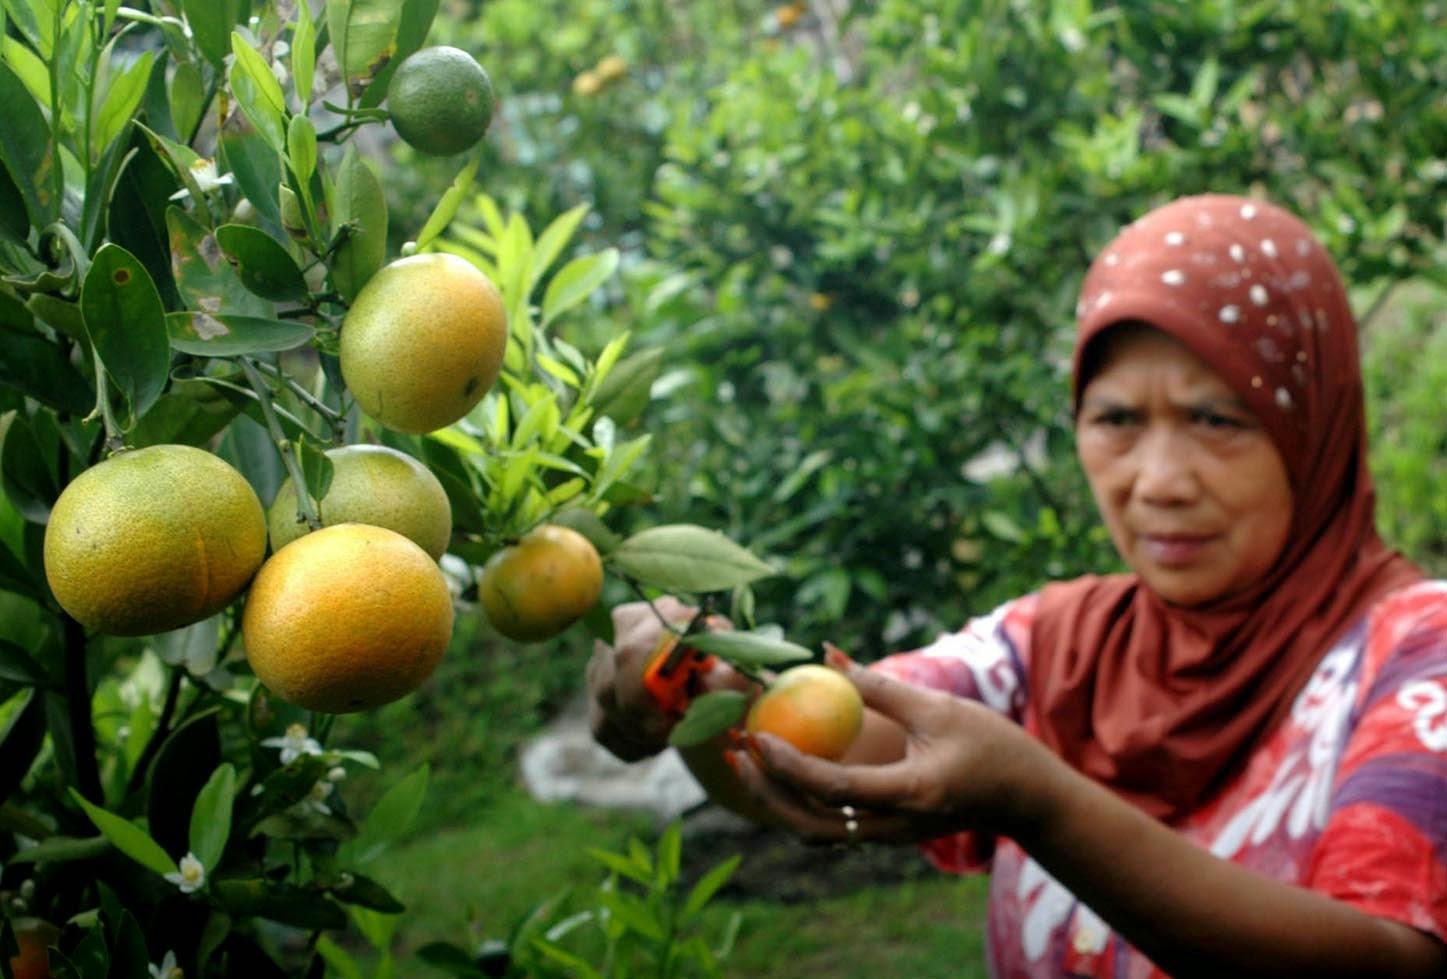 Cinta Buah Lokal Indonesia, Kenapa Tidak?   galassia del sogno